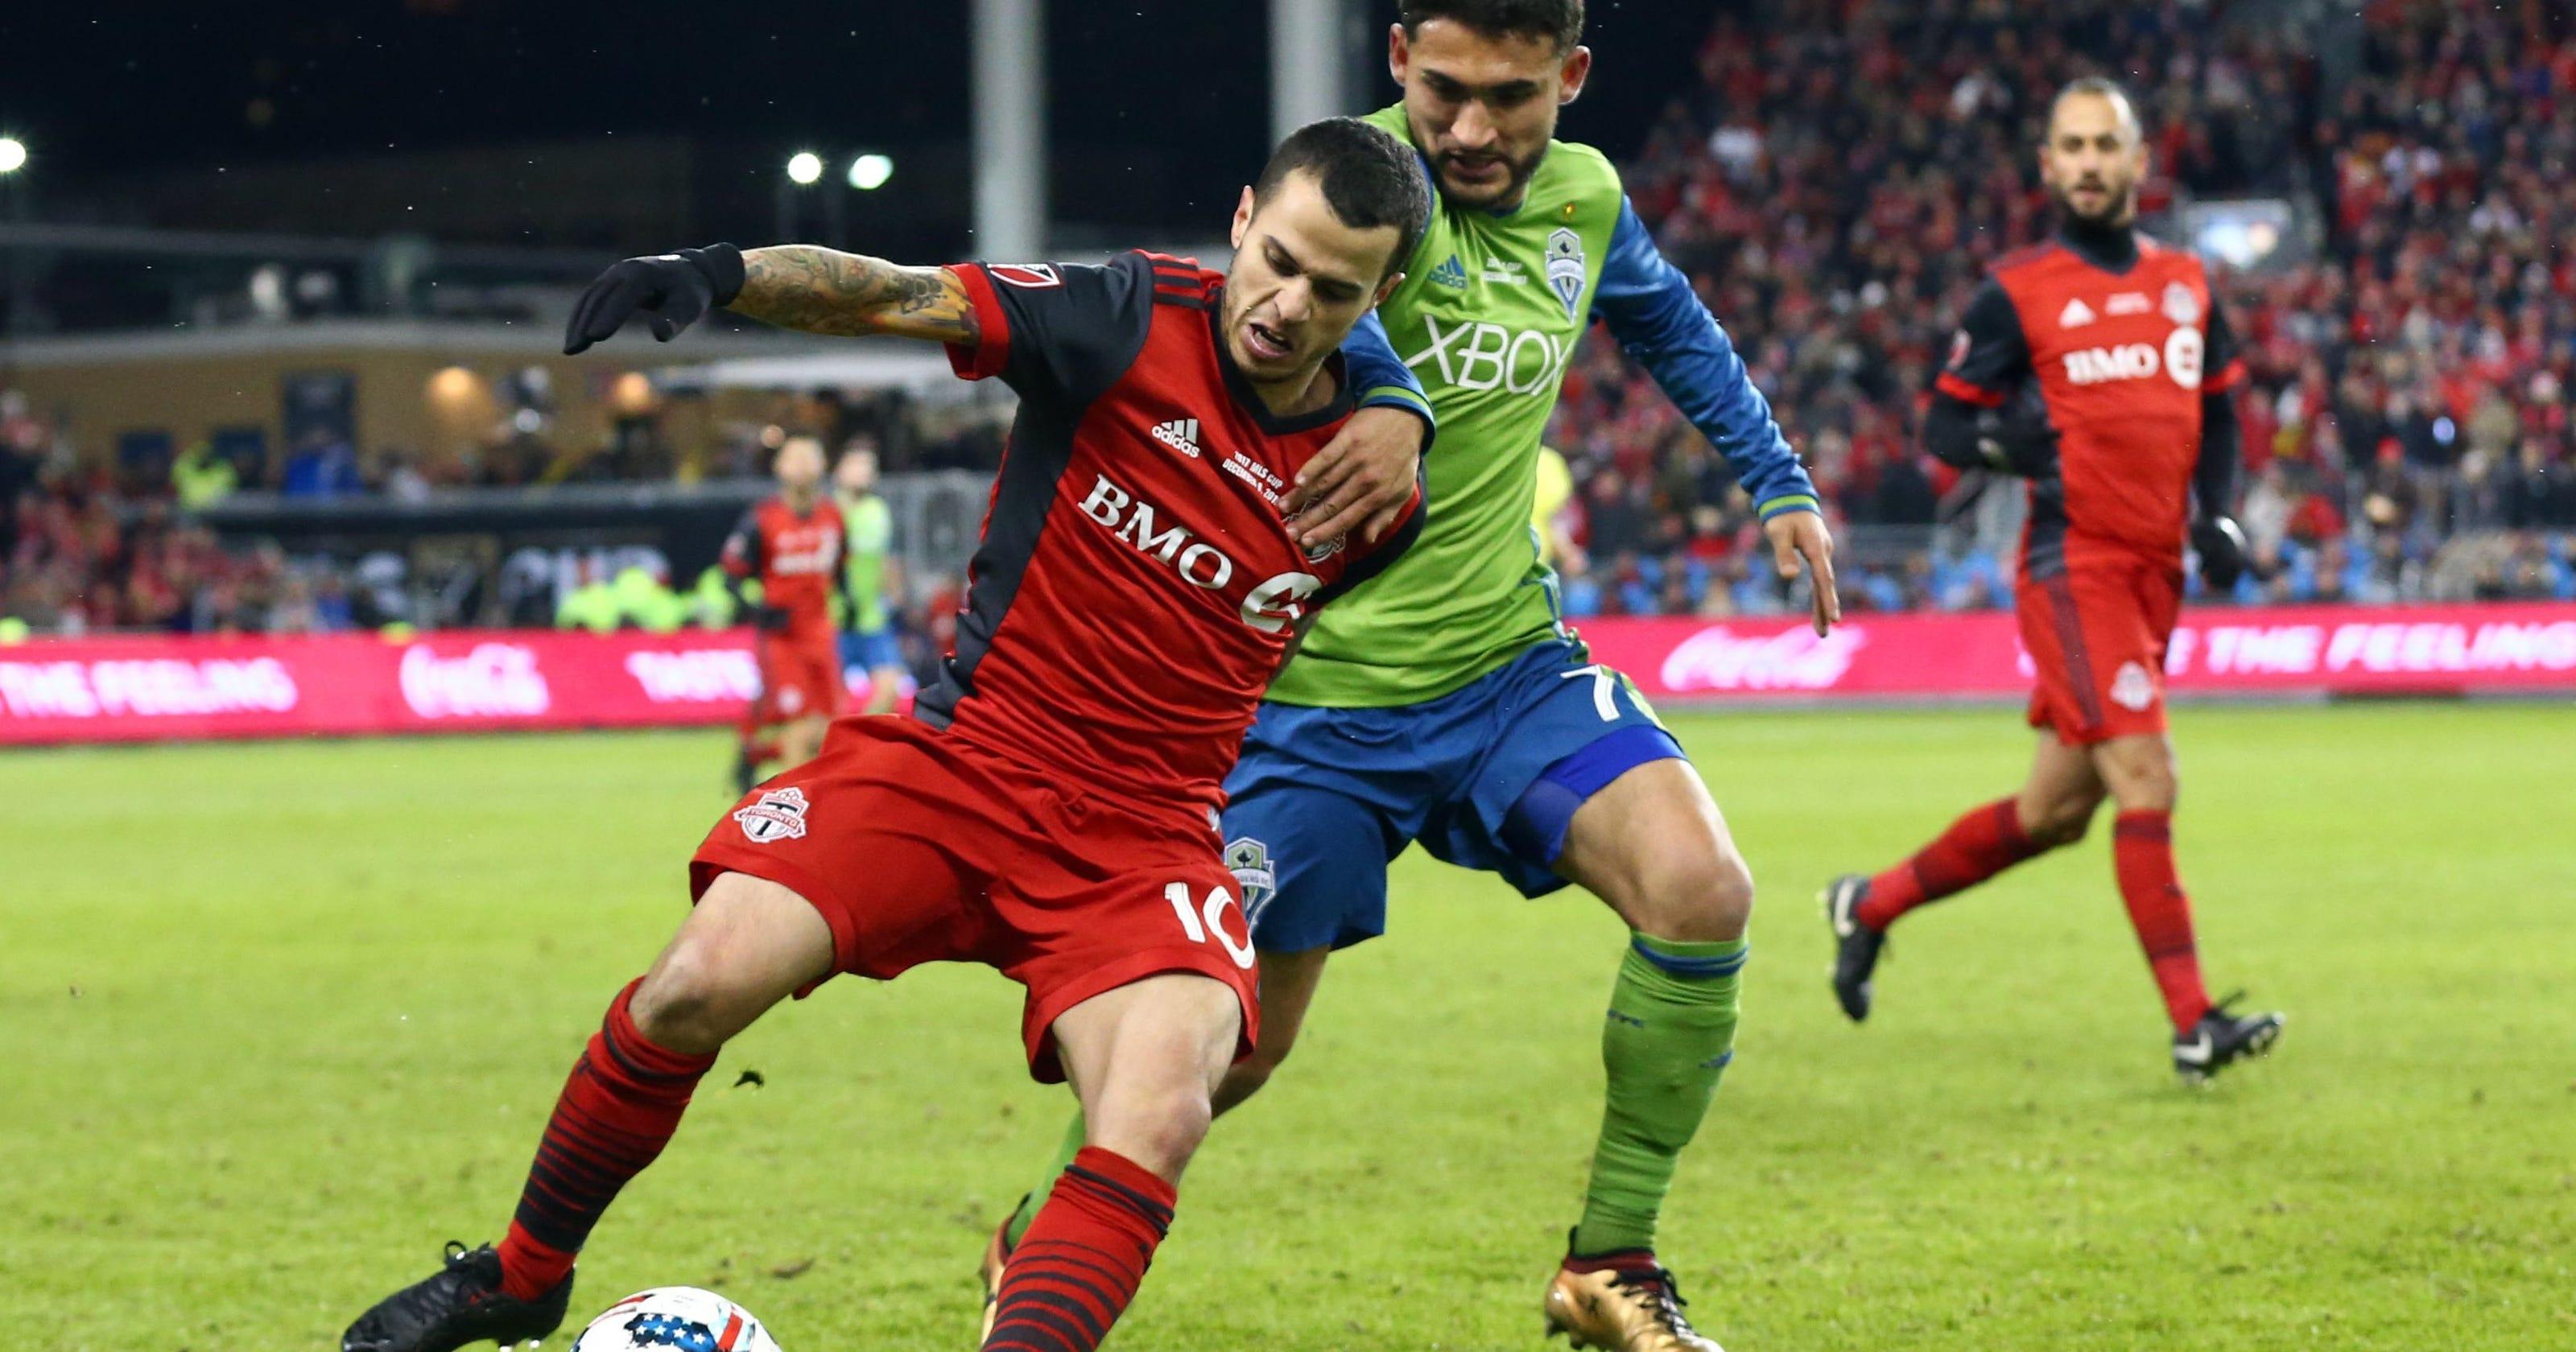 MLS sports betting sponsorships